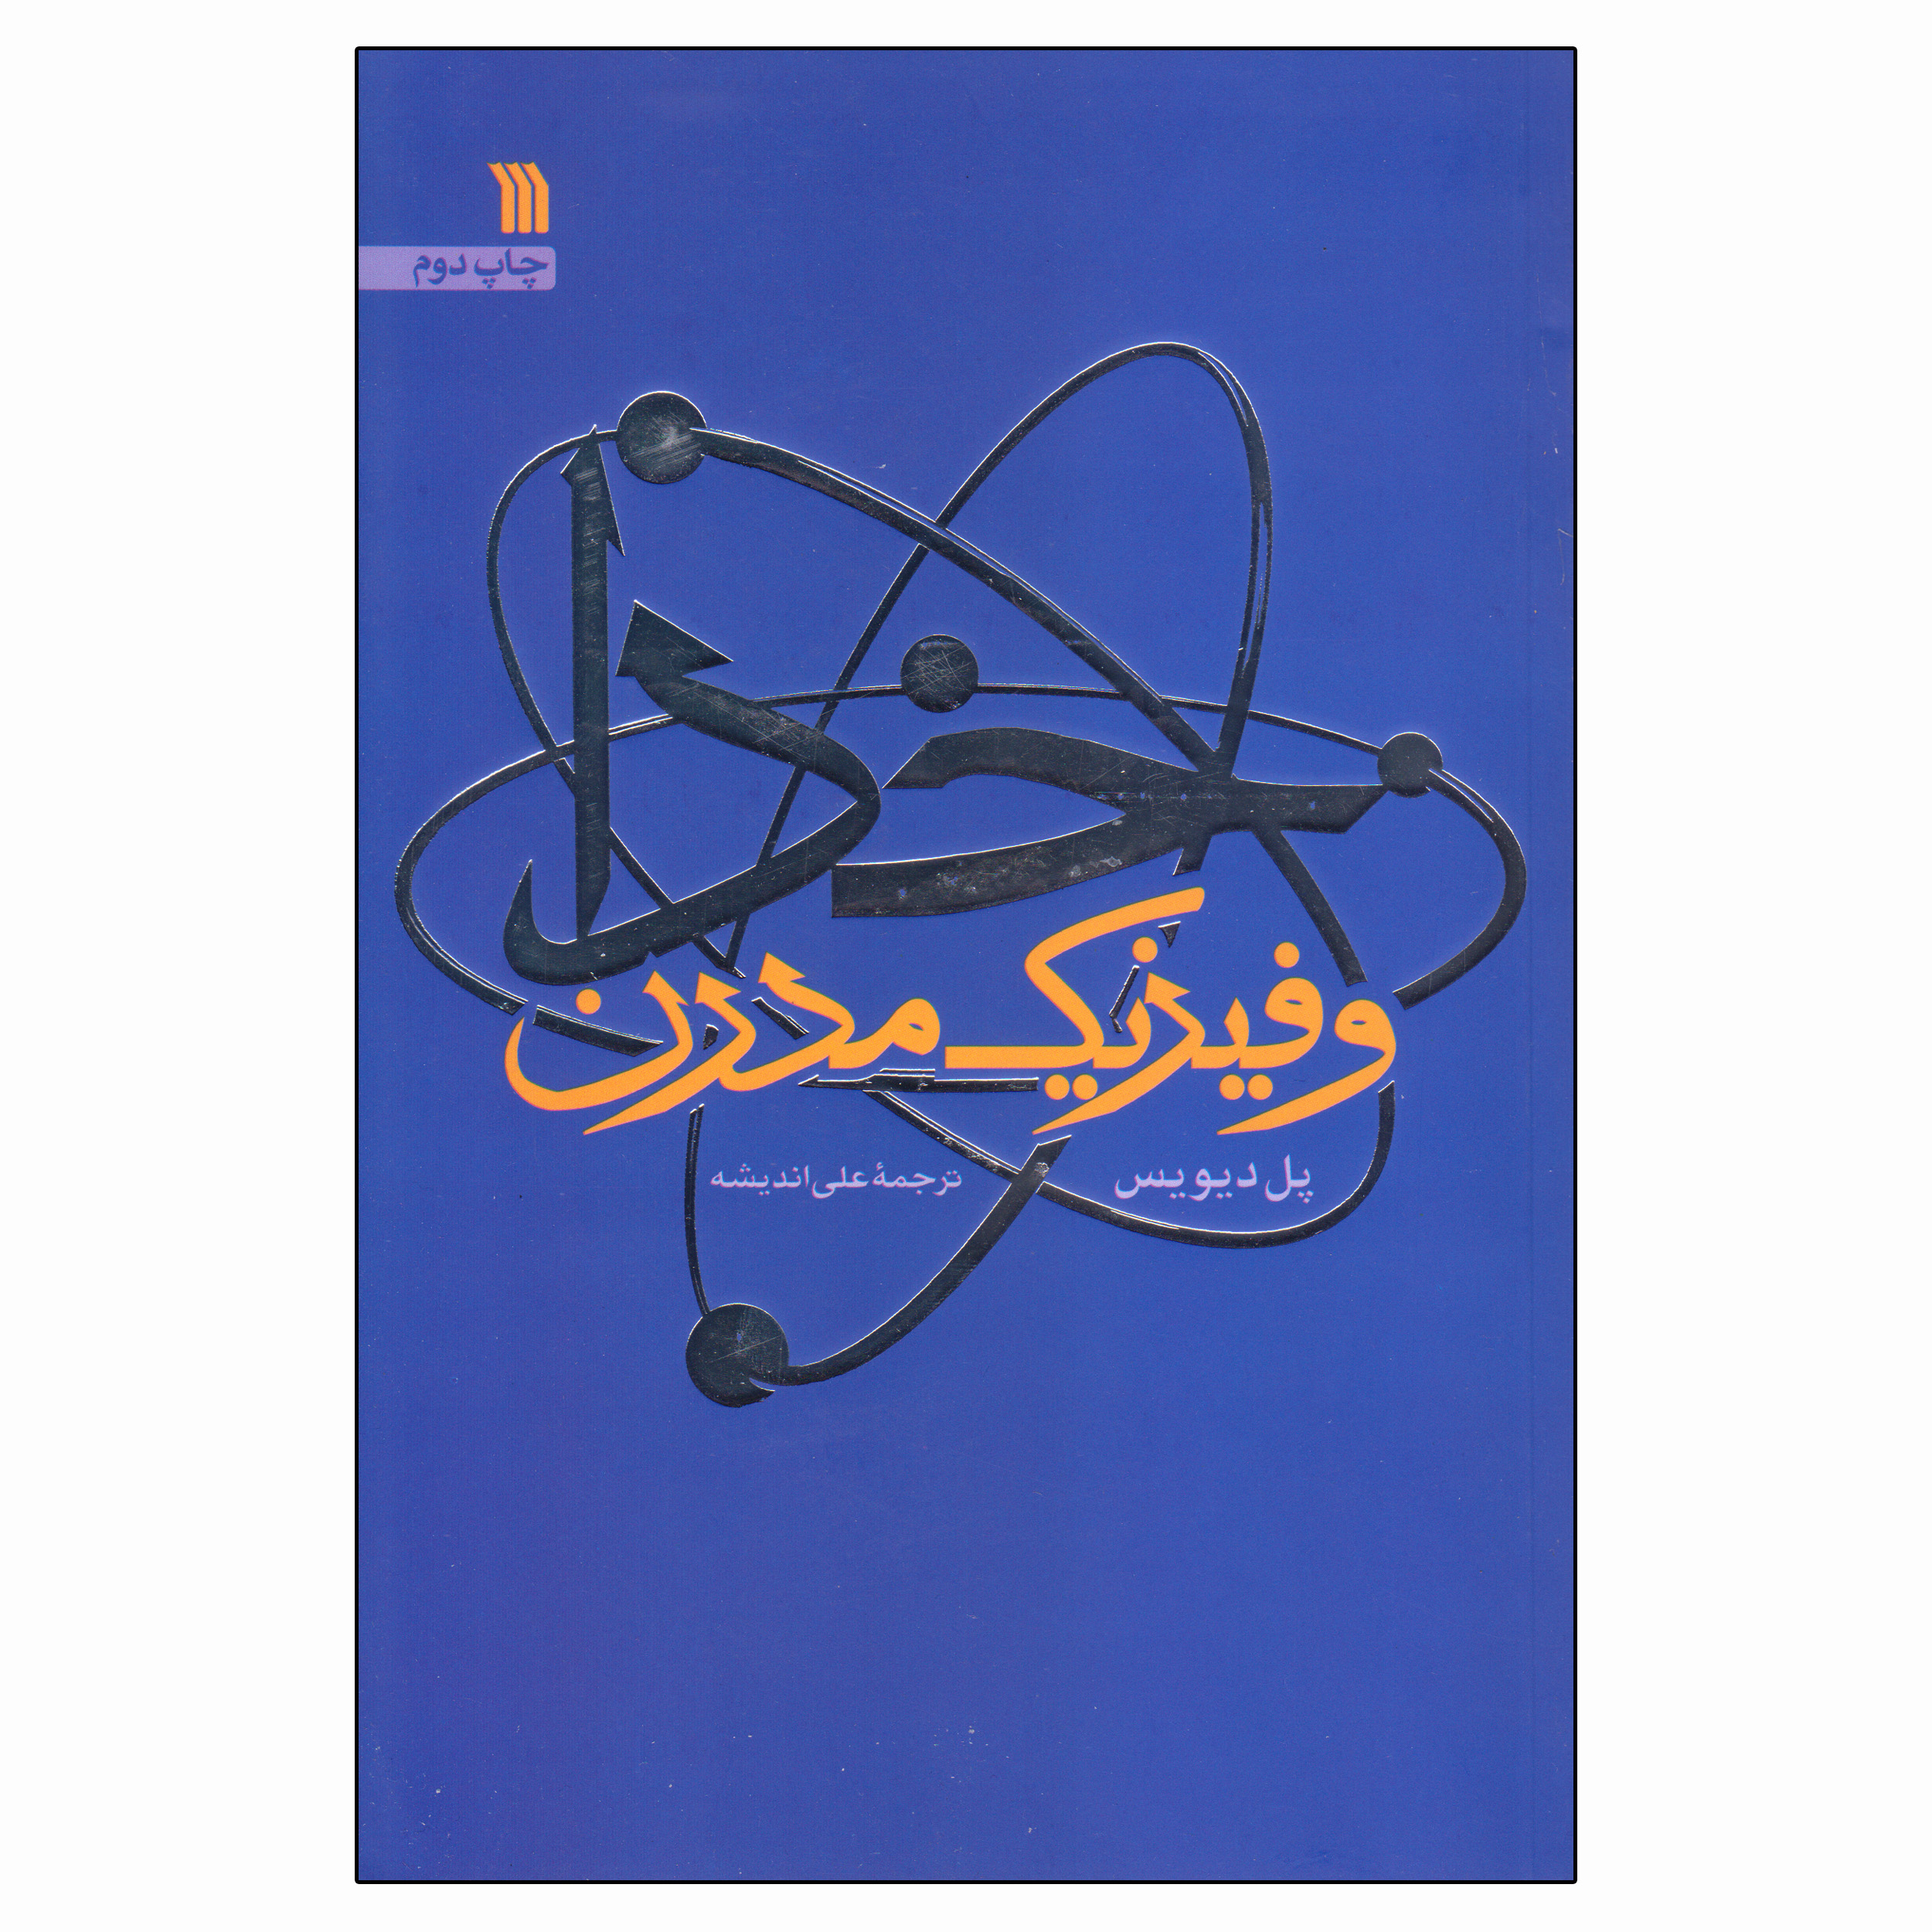 خرید                      کتاب خدا و فیزیک مدرن اثر پل دیویس انتشارات سروش